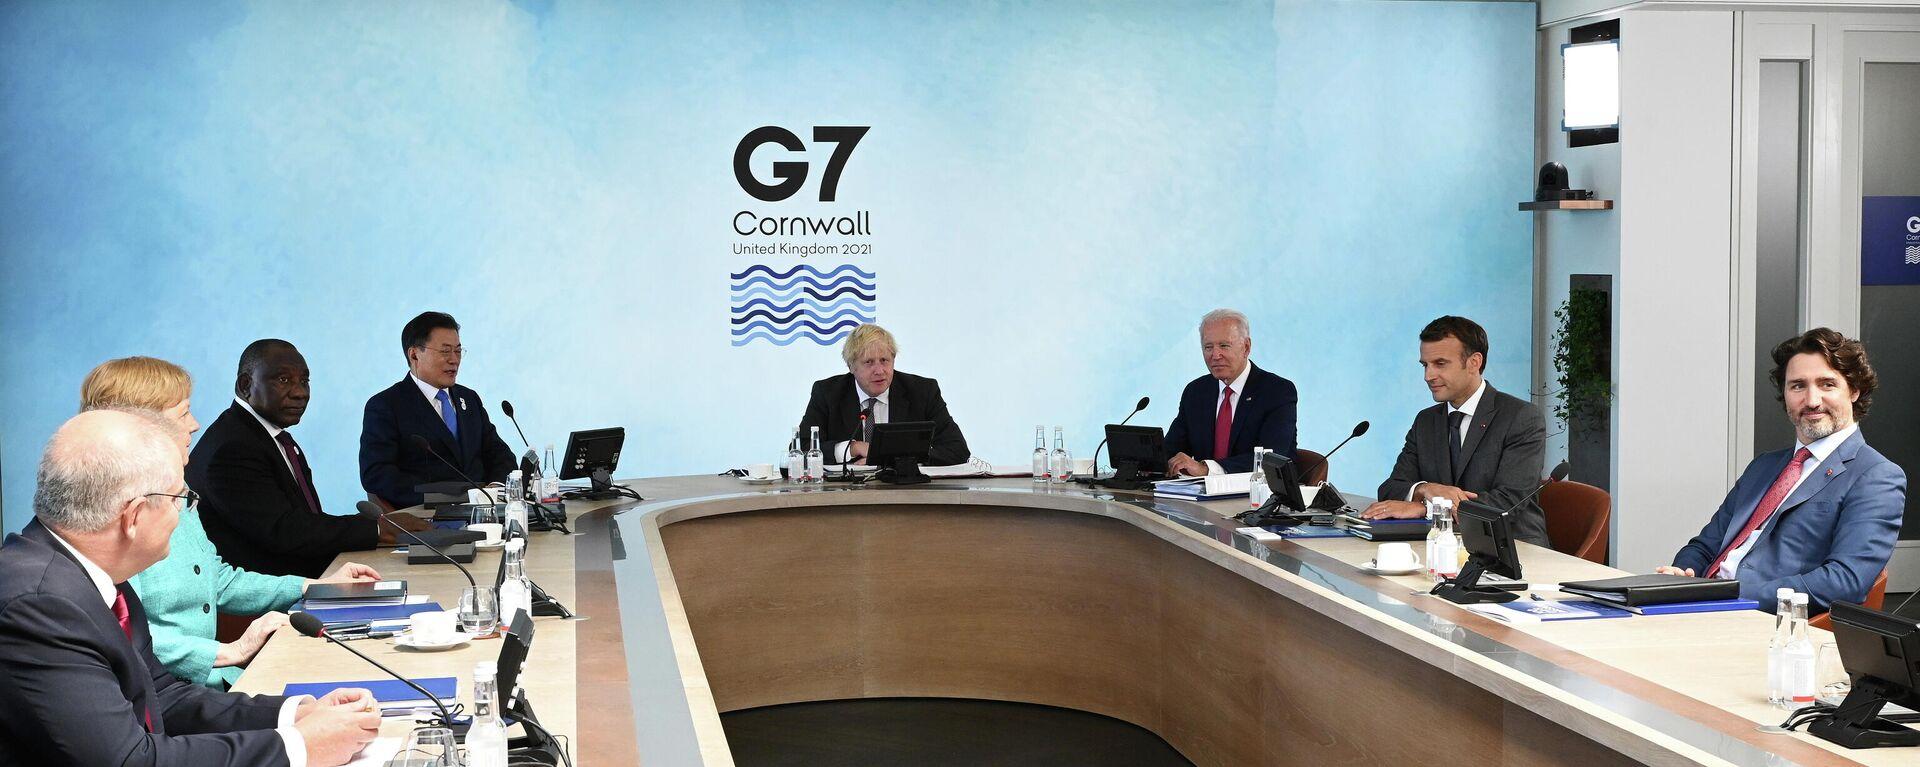 Cumbre del G7 en Cornwall, Reino Unido - Sputnik Mundo, 1920, 14.06.2021